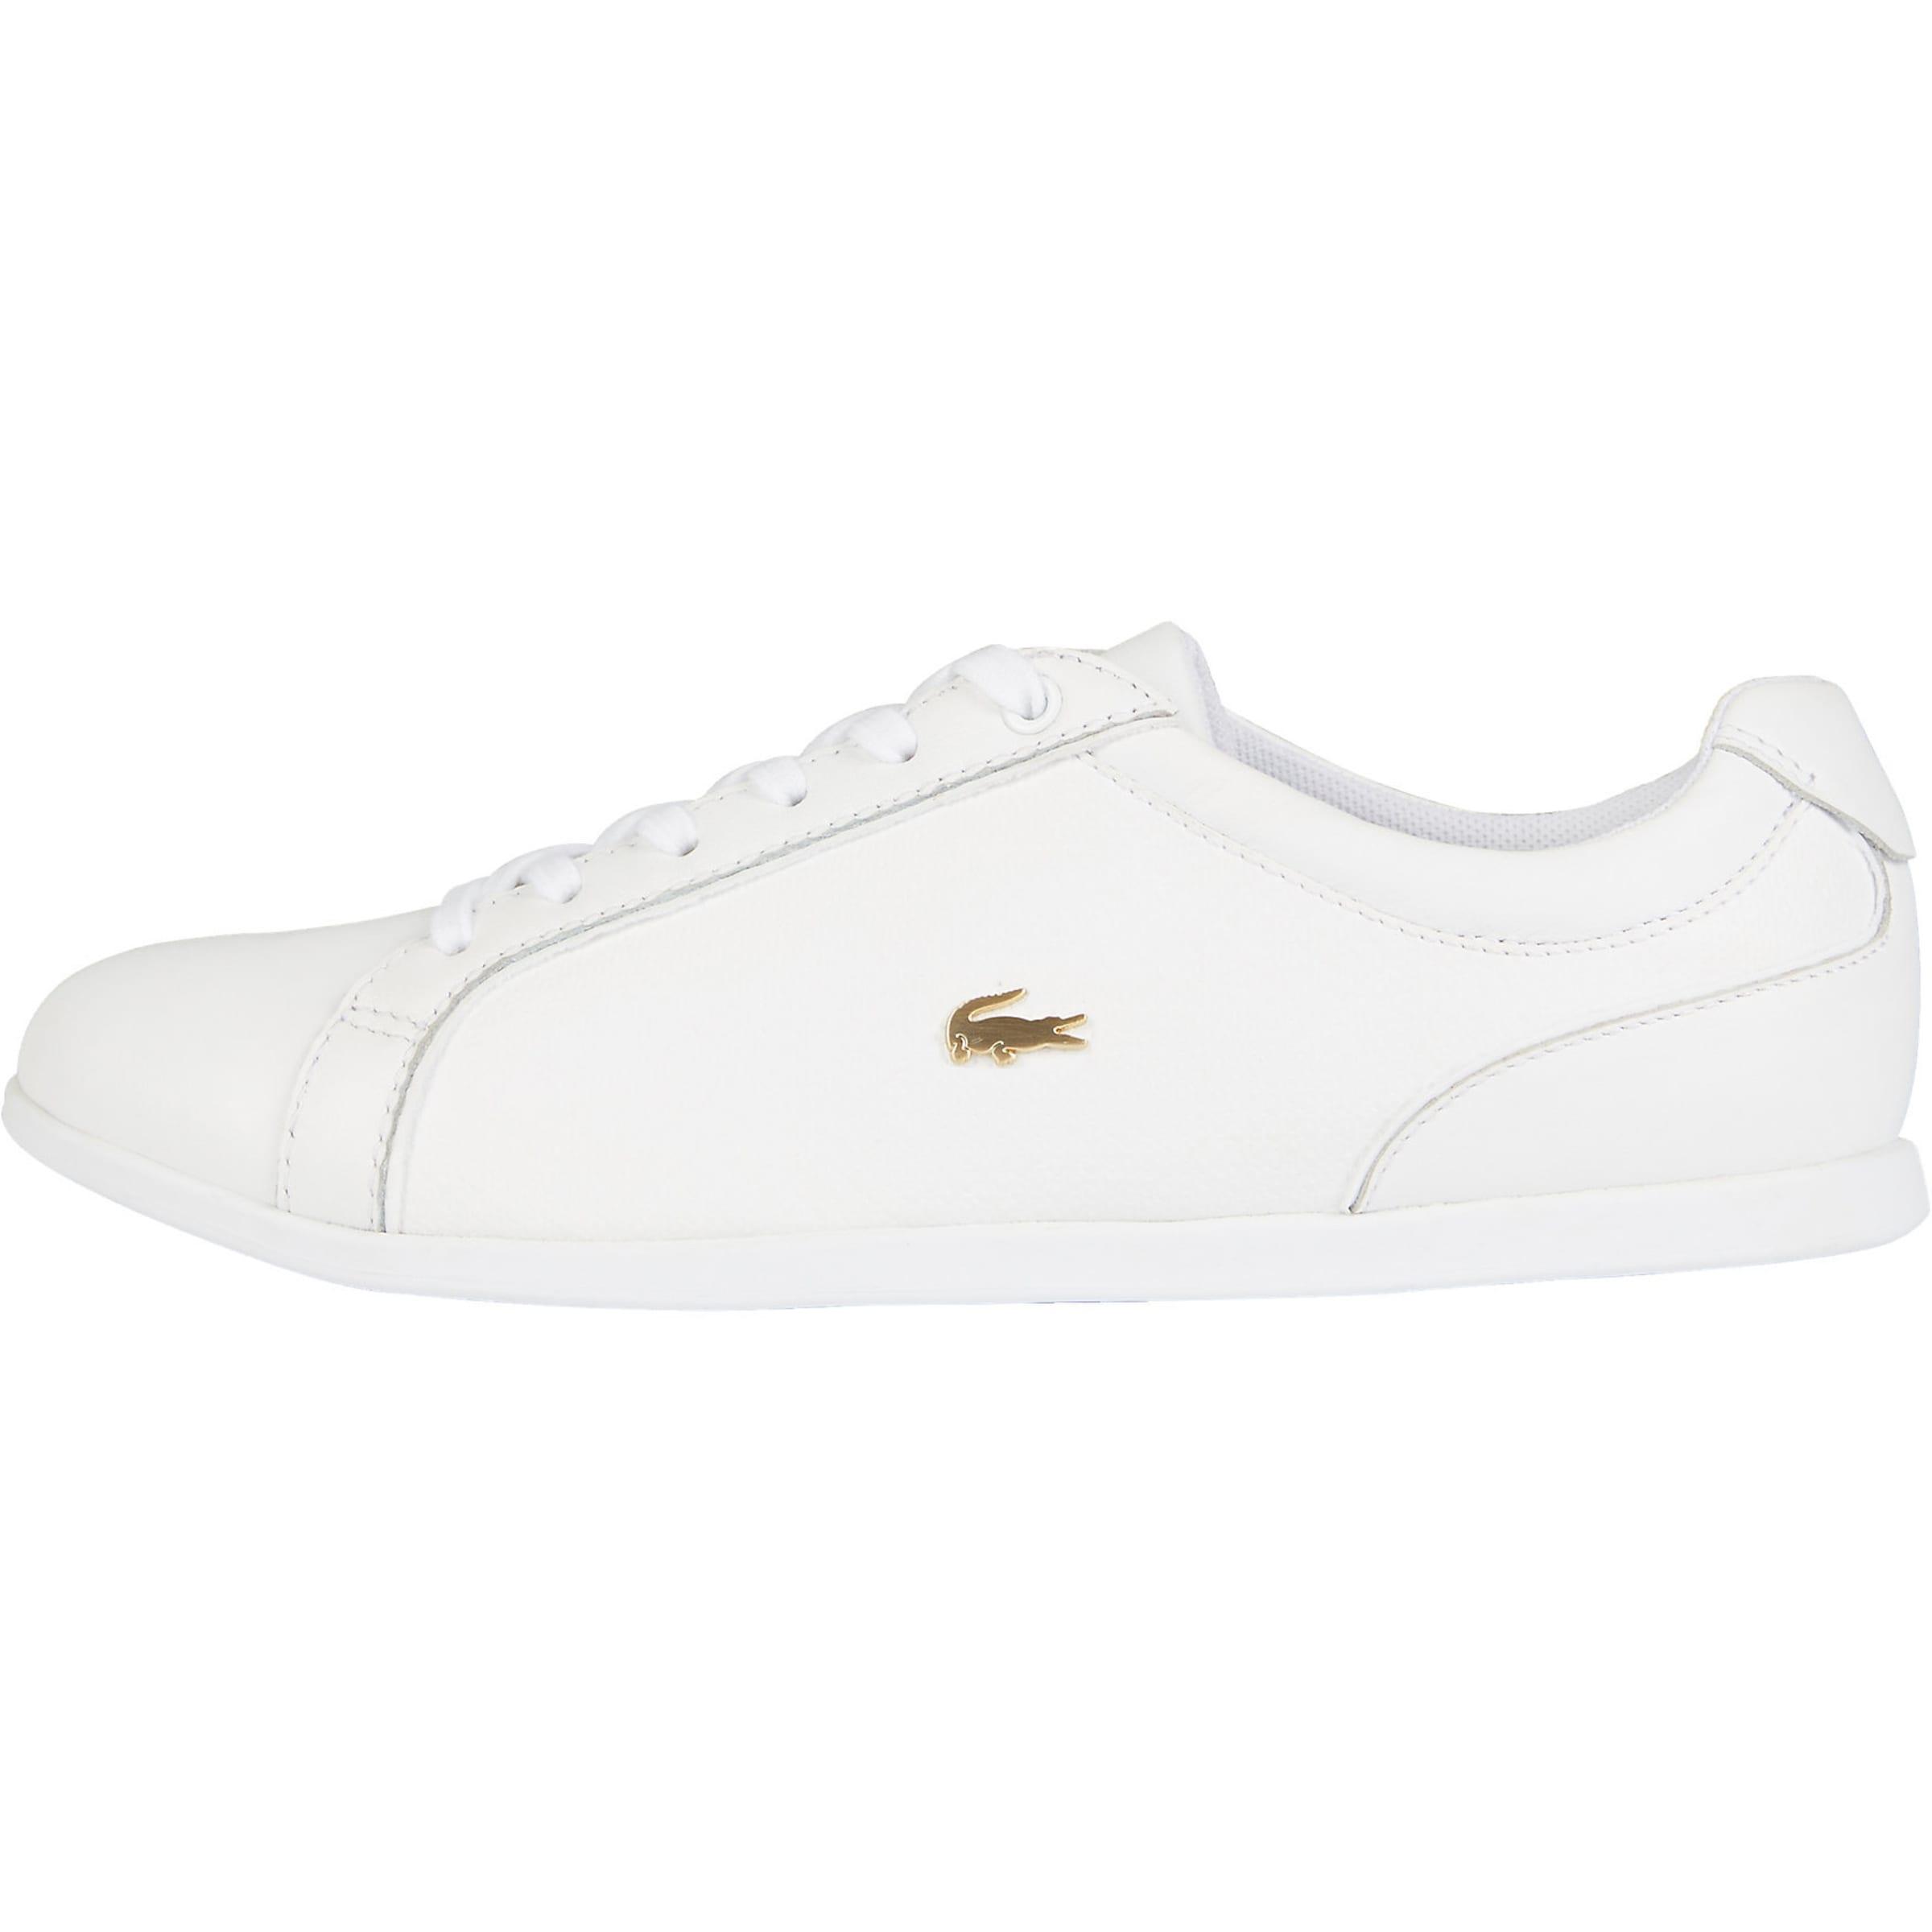 LACOSTE Rey Lace Sneakers Verschleißfeste billige Schuhe